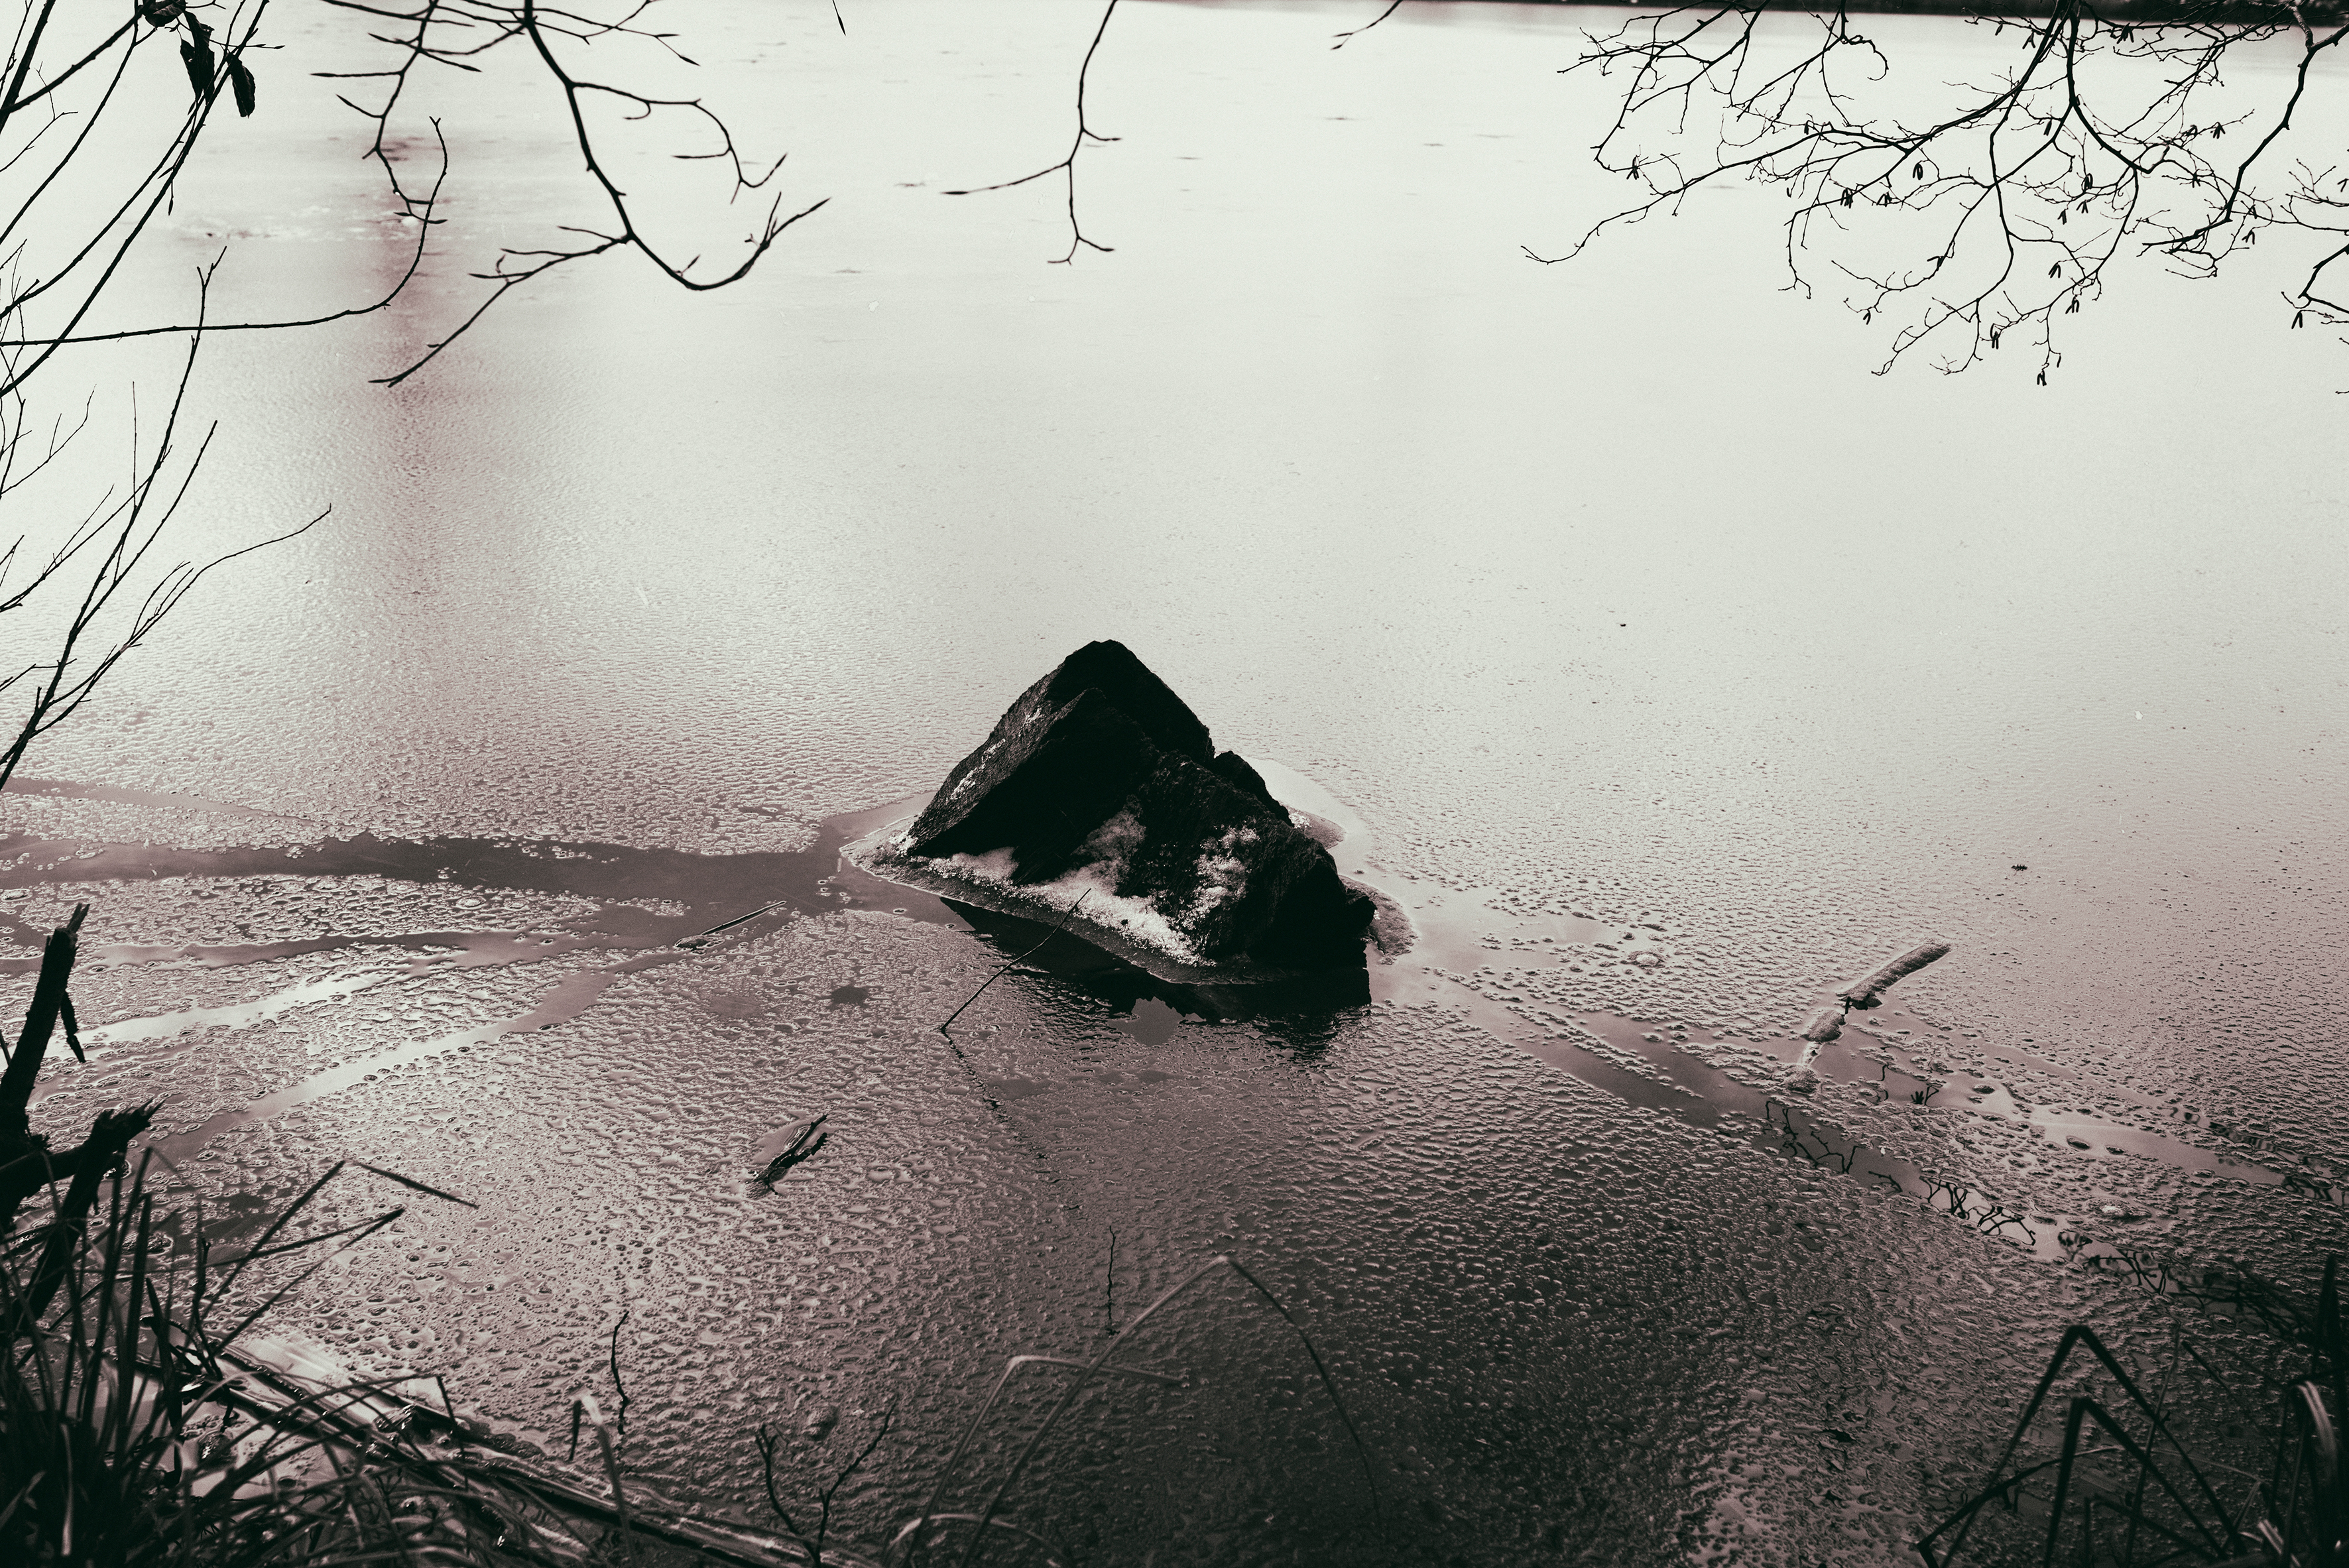 by Miguel Carbajal